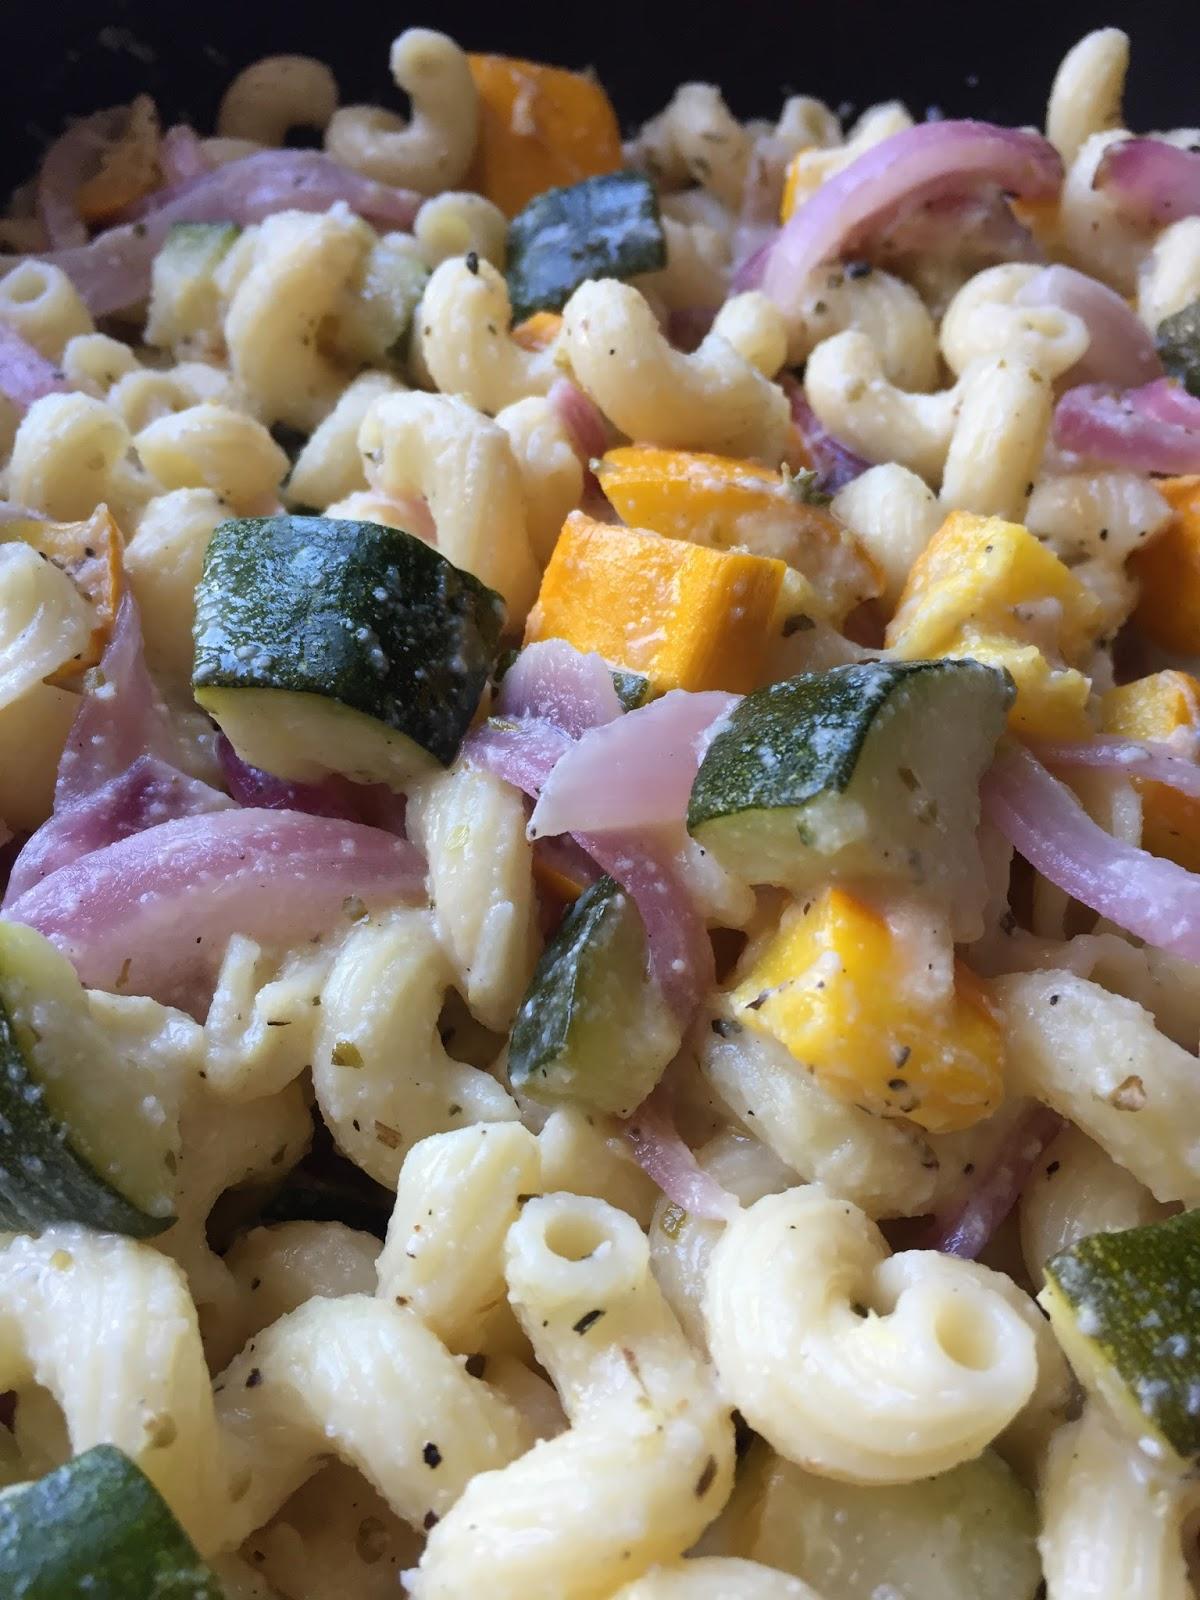 Katie Cooks Dinner: ROASTED VEGGIE PASTA IN CREAMY FETA SAUCE